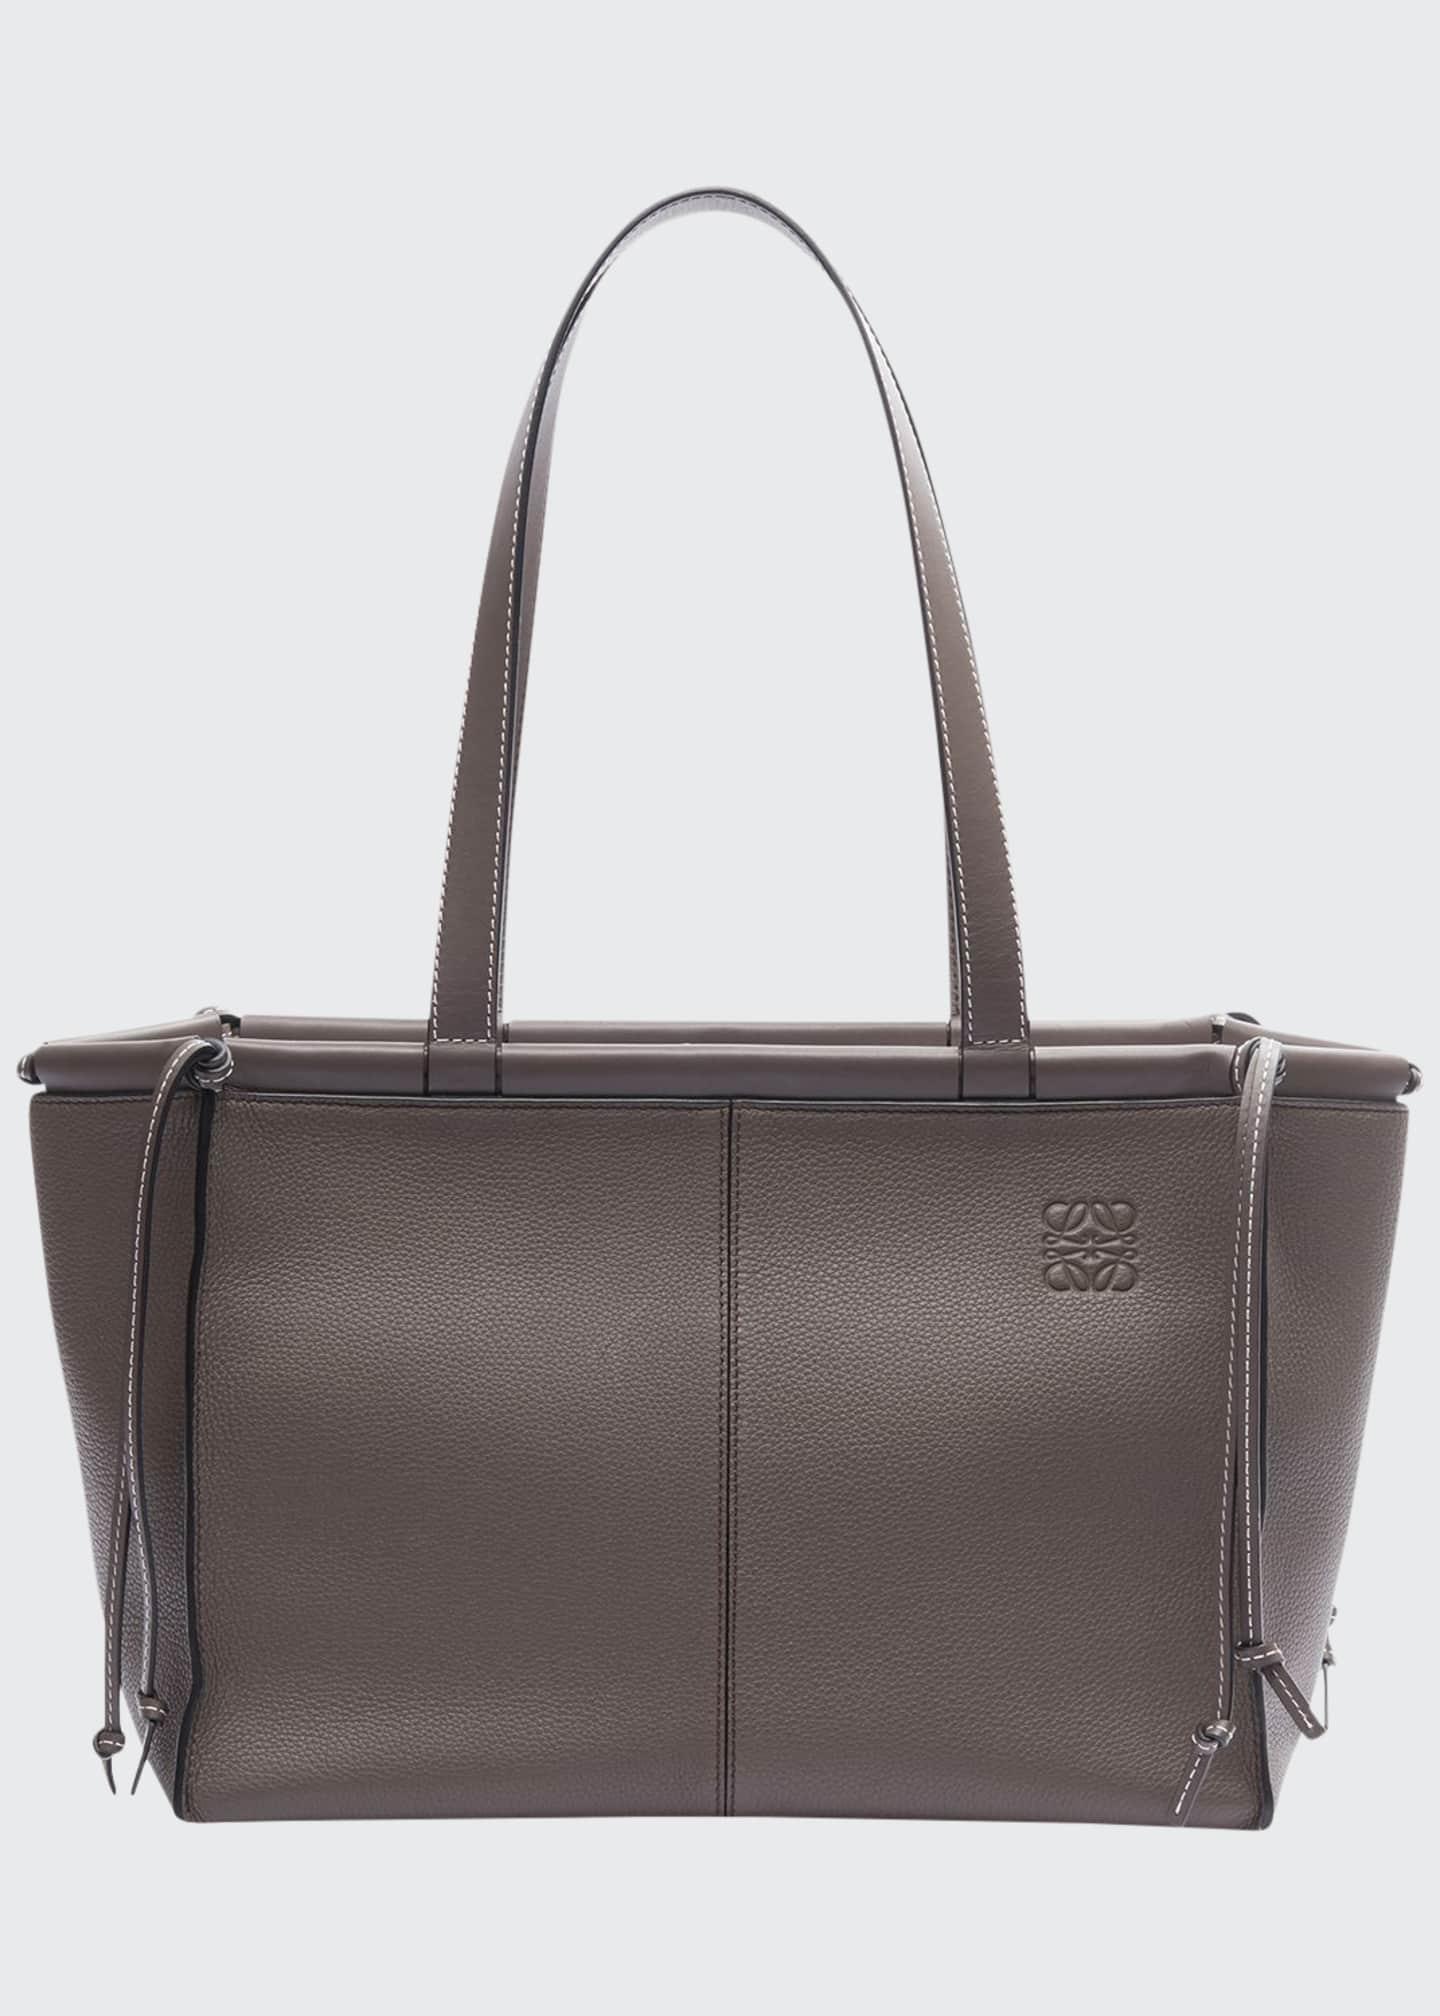 Loewe Soft Leather Tote Bag